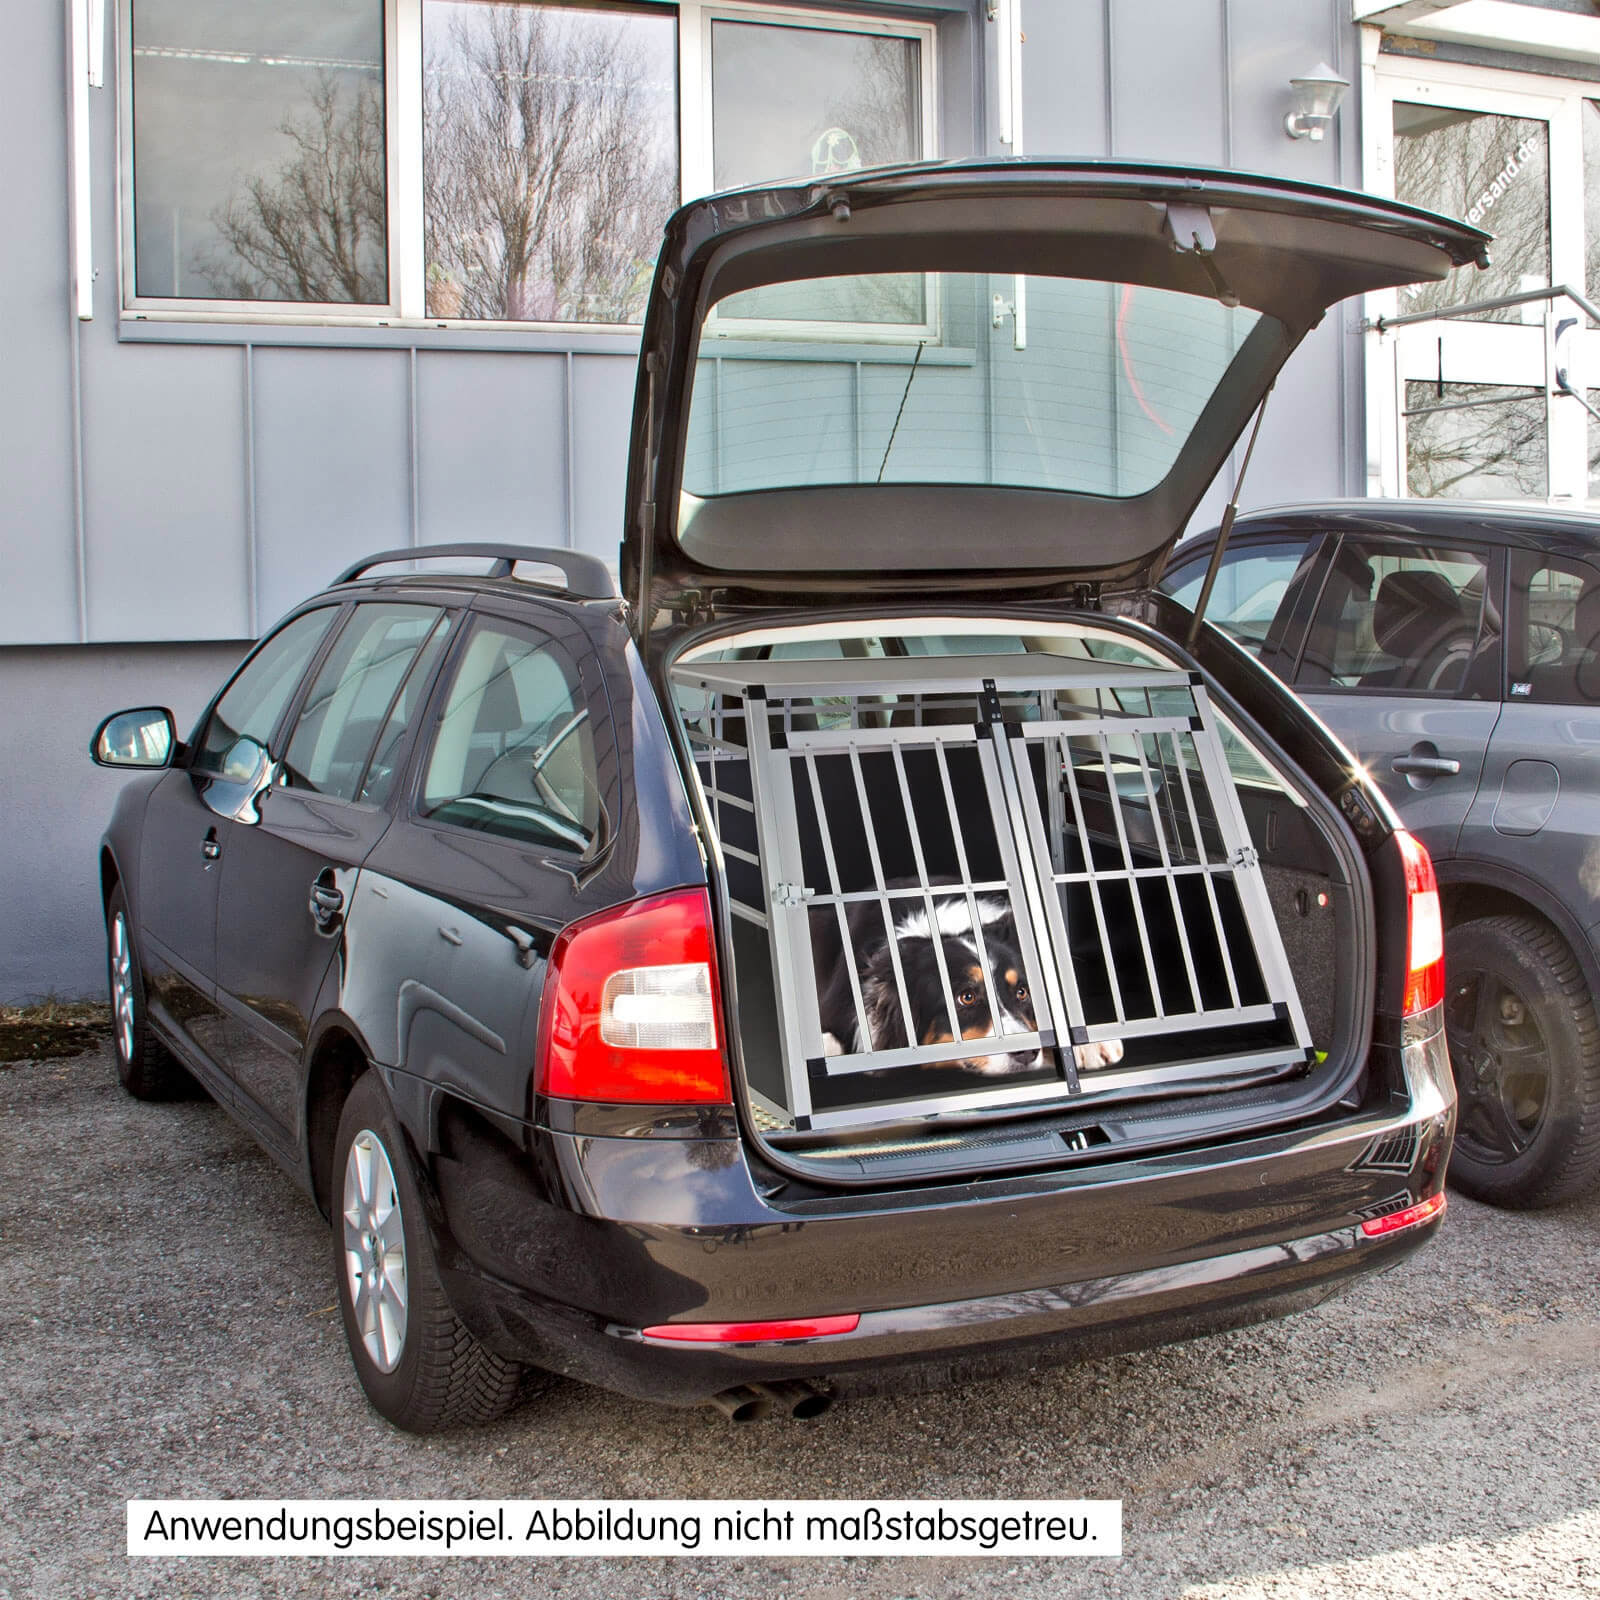 hundebox hundetransportbox balu f r auto kfz. Black Bedroom Furniture Sets. Home Design Ideas